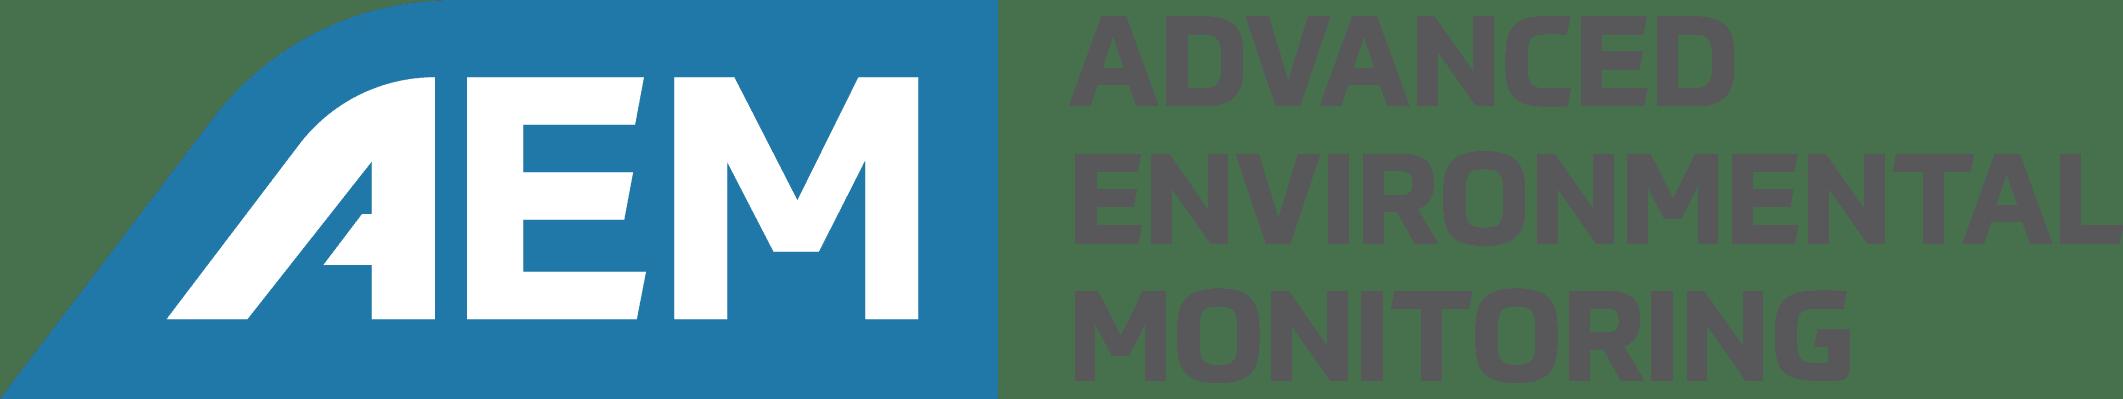 aem monitoring van bevede